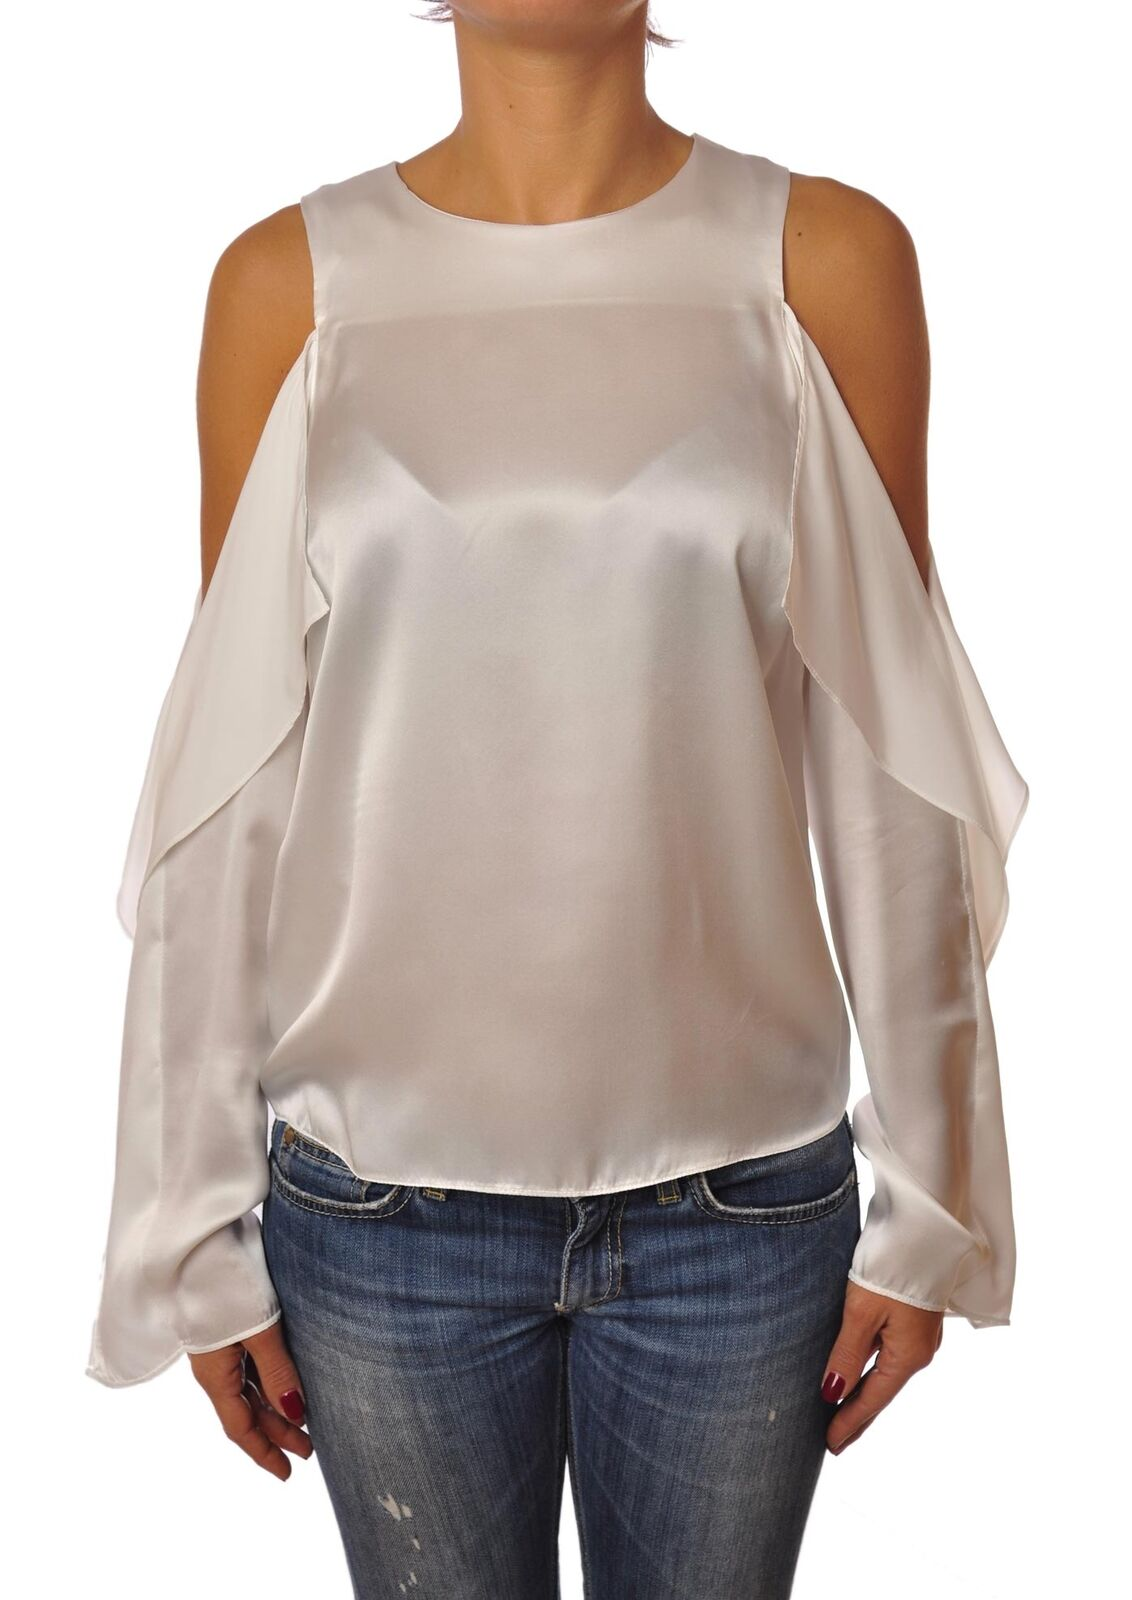 Rosao - Camicie-Blause - damen - Bianco - 4296328M184019